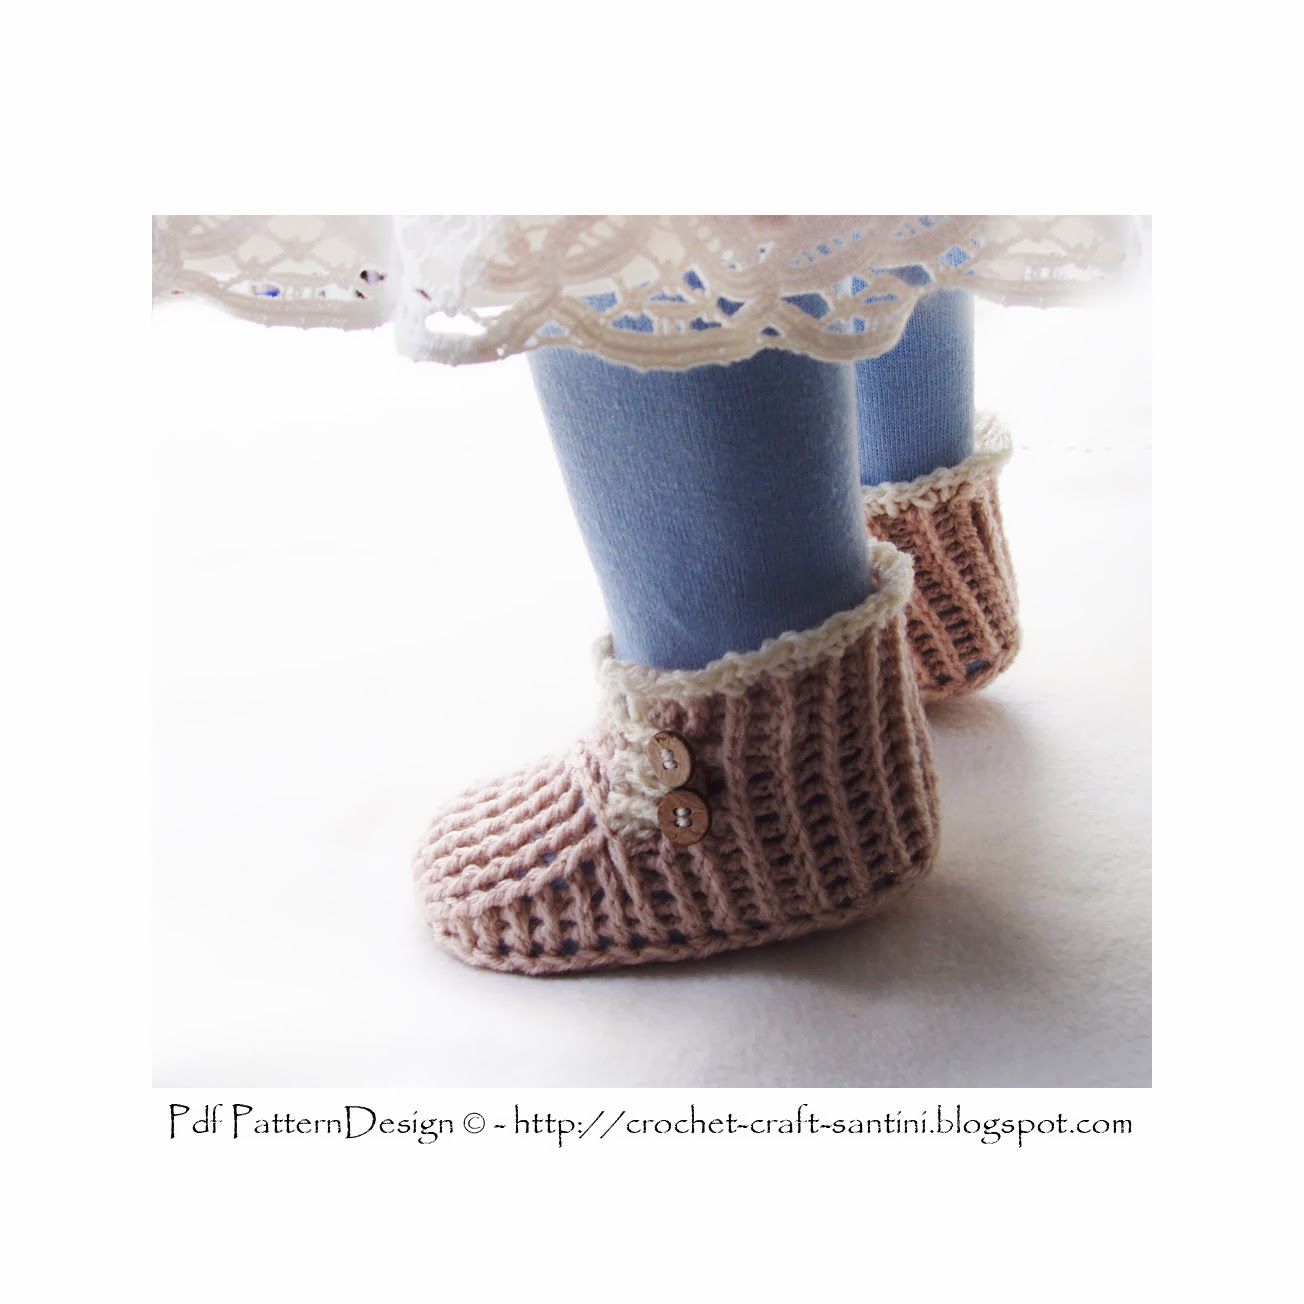 Crochet Wrap Around Button Baby Boots Pattern : Sophie and Me: WRAP AND BUTTON - BABY BOOTIES CROCHET PATTERN!